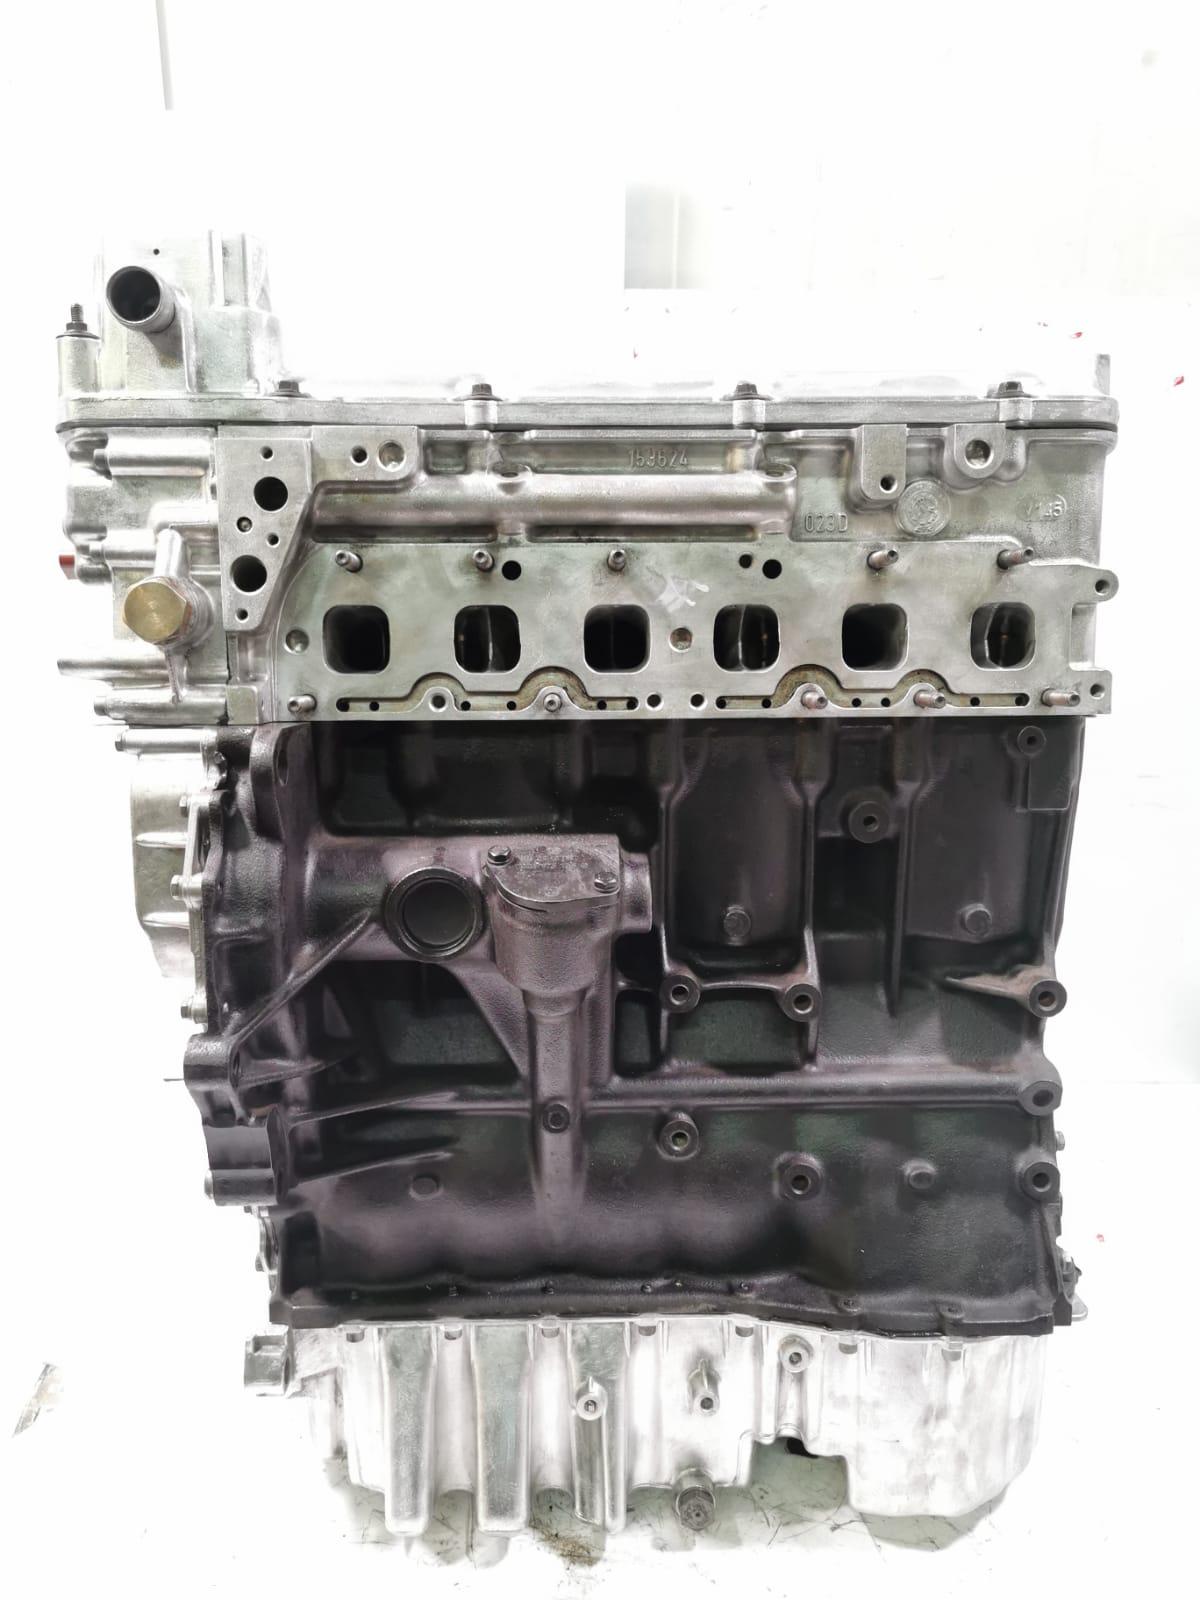 Motor Steuerkette Dichtung NEU Zylinderkopf geplant Audi A3 3,2 V6 quattro BMJ